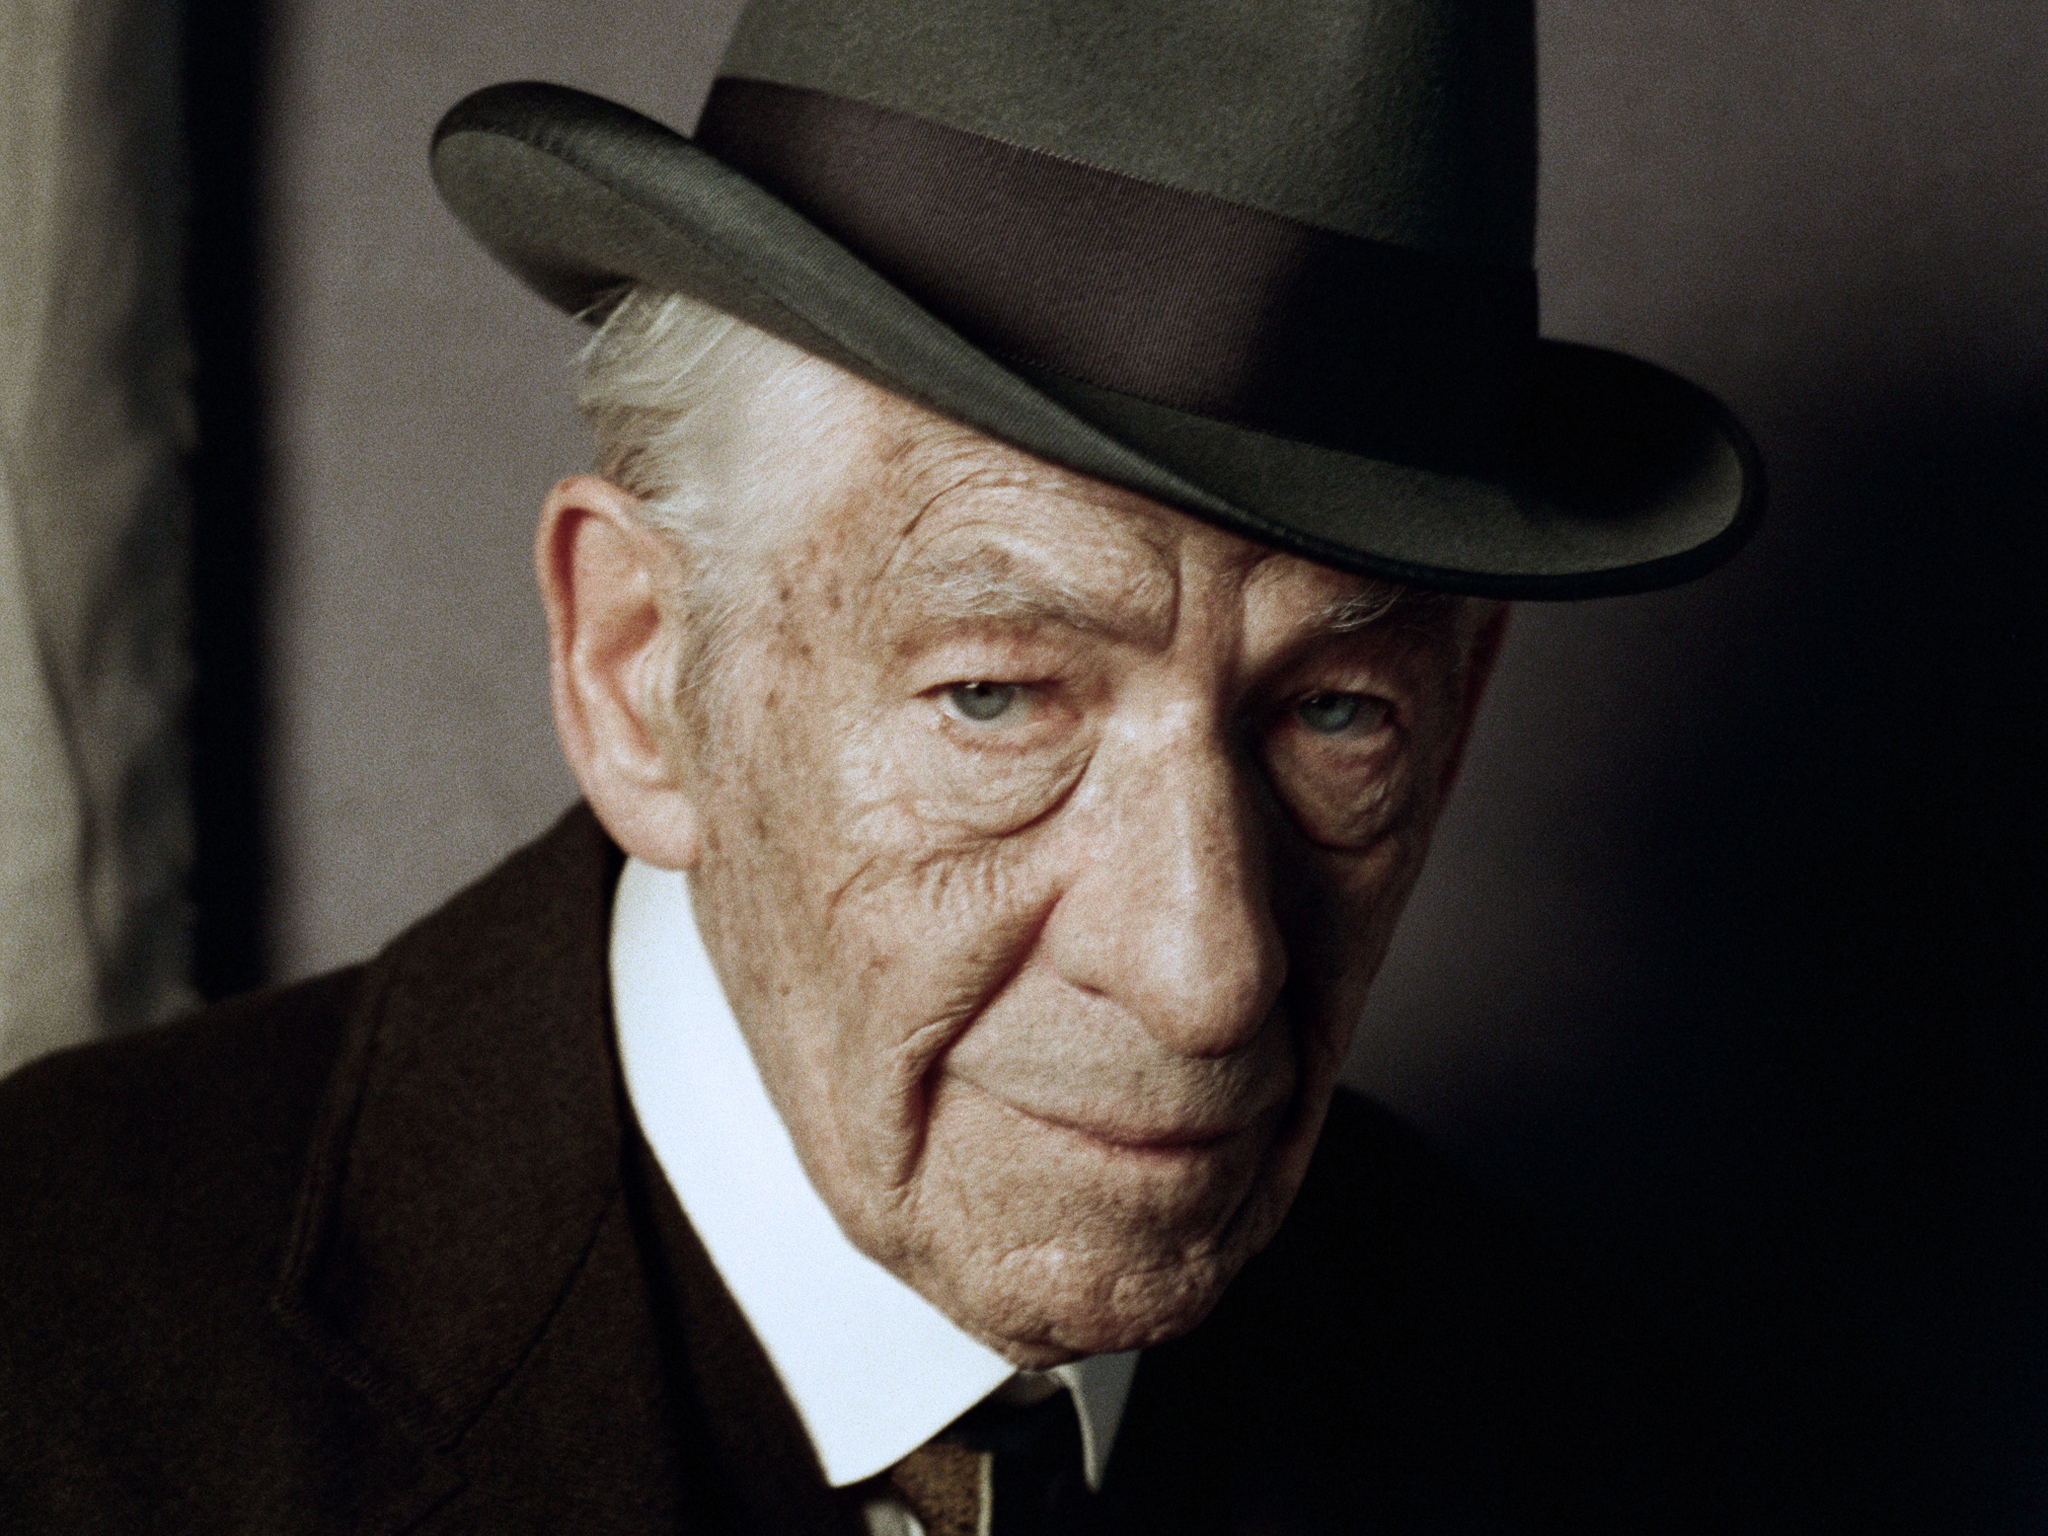 Sir Ian McKellen on bringing an aged Sherlock to the big screen for 'Mr Holmes'